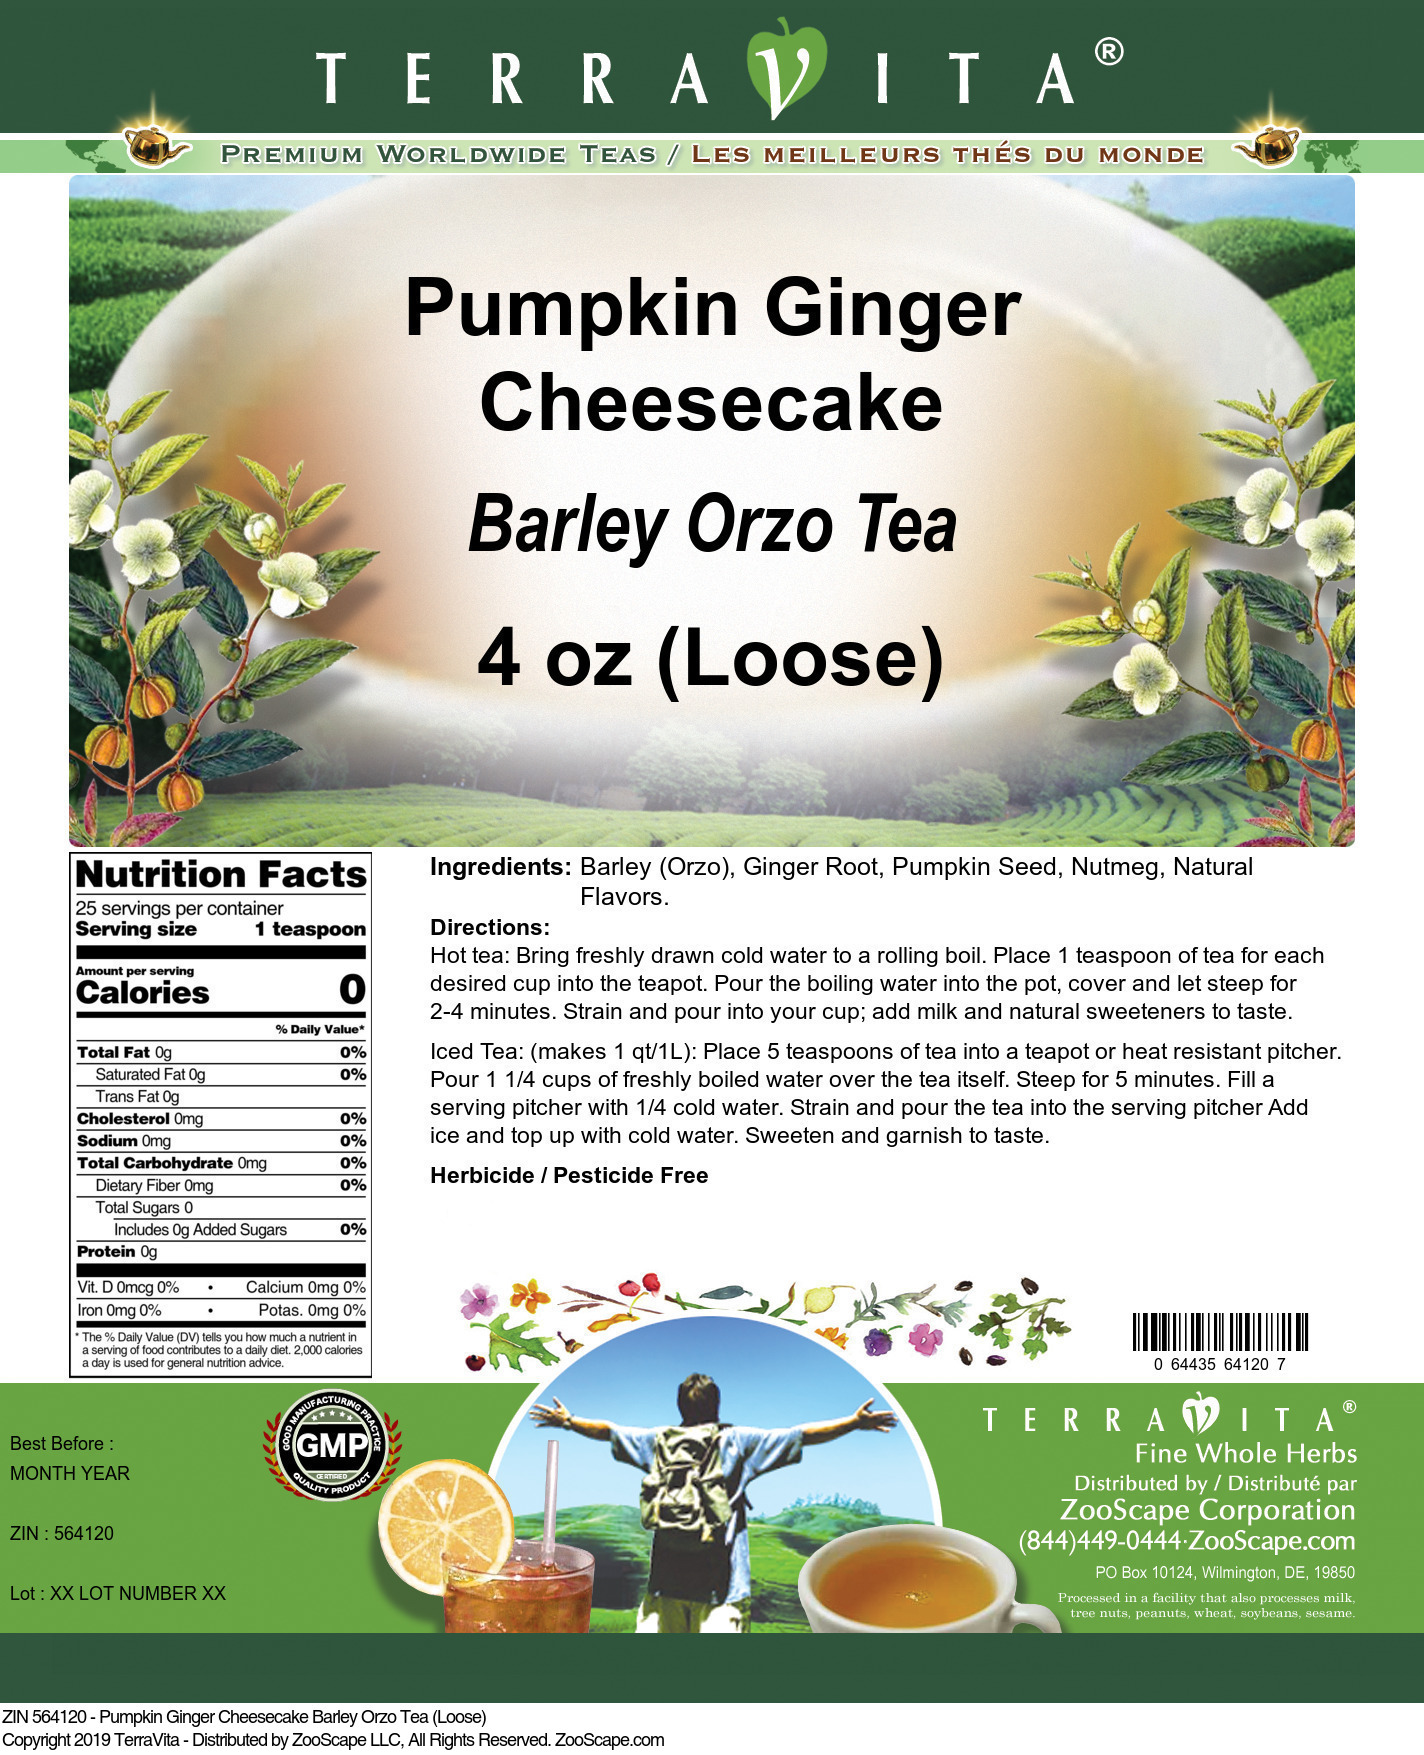 Pumpkin Ginger Cheesecake Barley Orzo Tea (Loose)